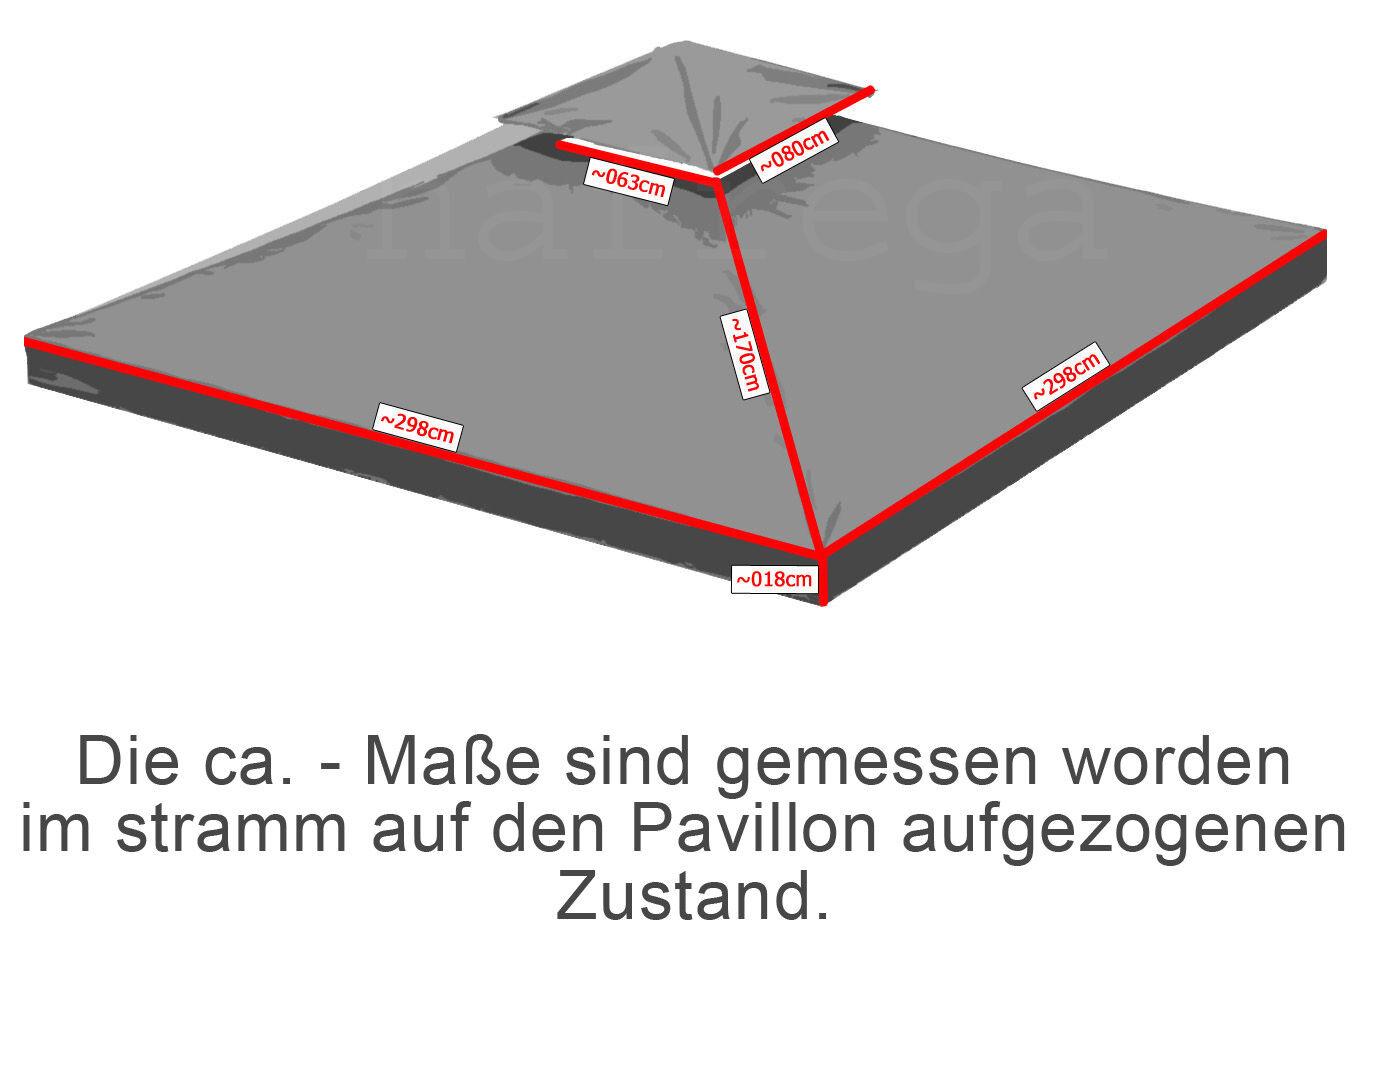 ersatzdach dach 310g wasserdicht f r pavillon m kaminabzug pavillondach chf. Black Bedroom Furniture Sets. Home Design Ideas